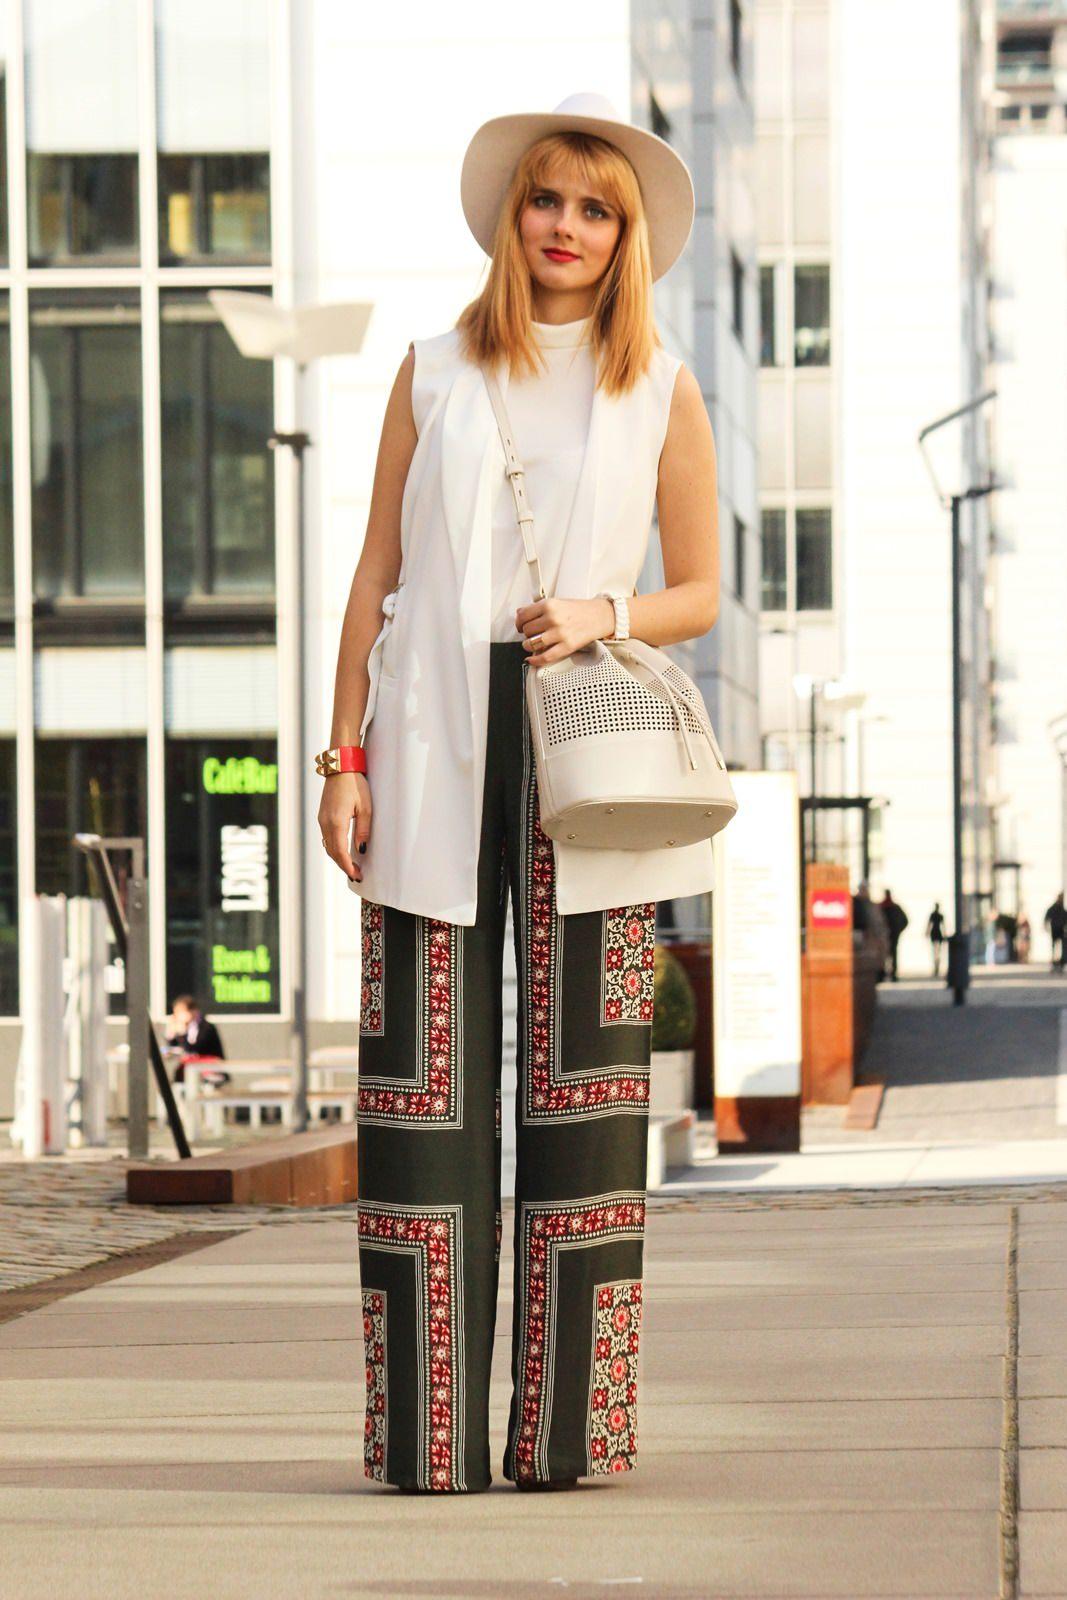 Des Belles Chosea_Fashionblog Cologne_Ethno palazzo trousers_Zara 3